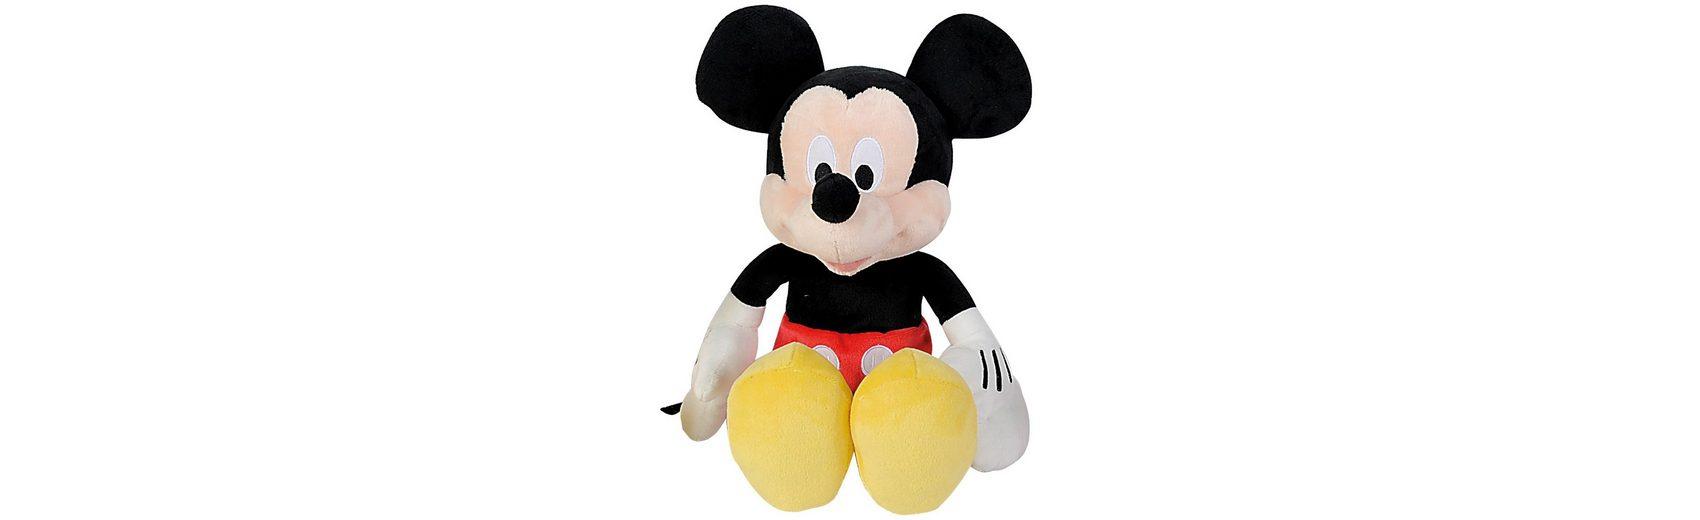 Simba Mickey Plüsch 35 cm